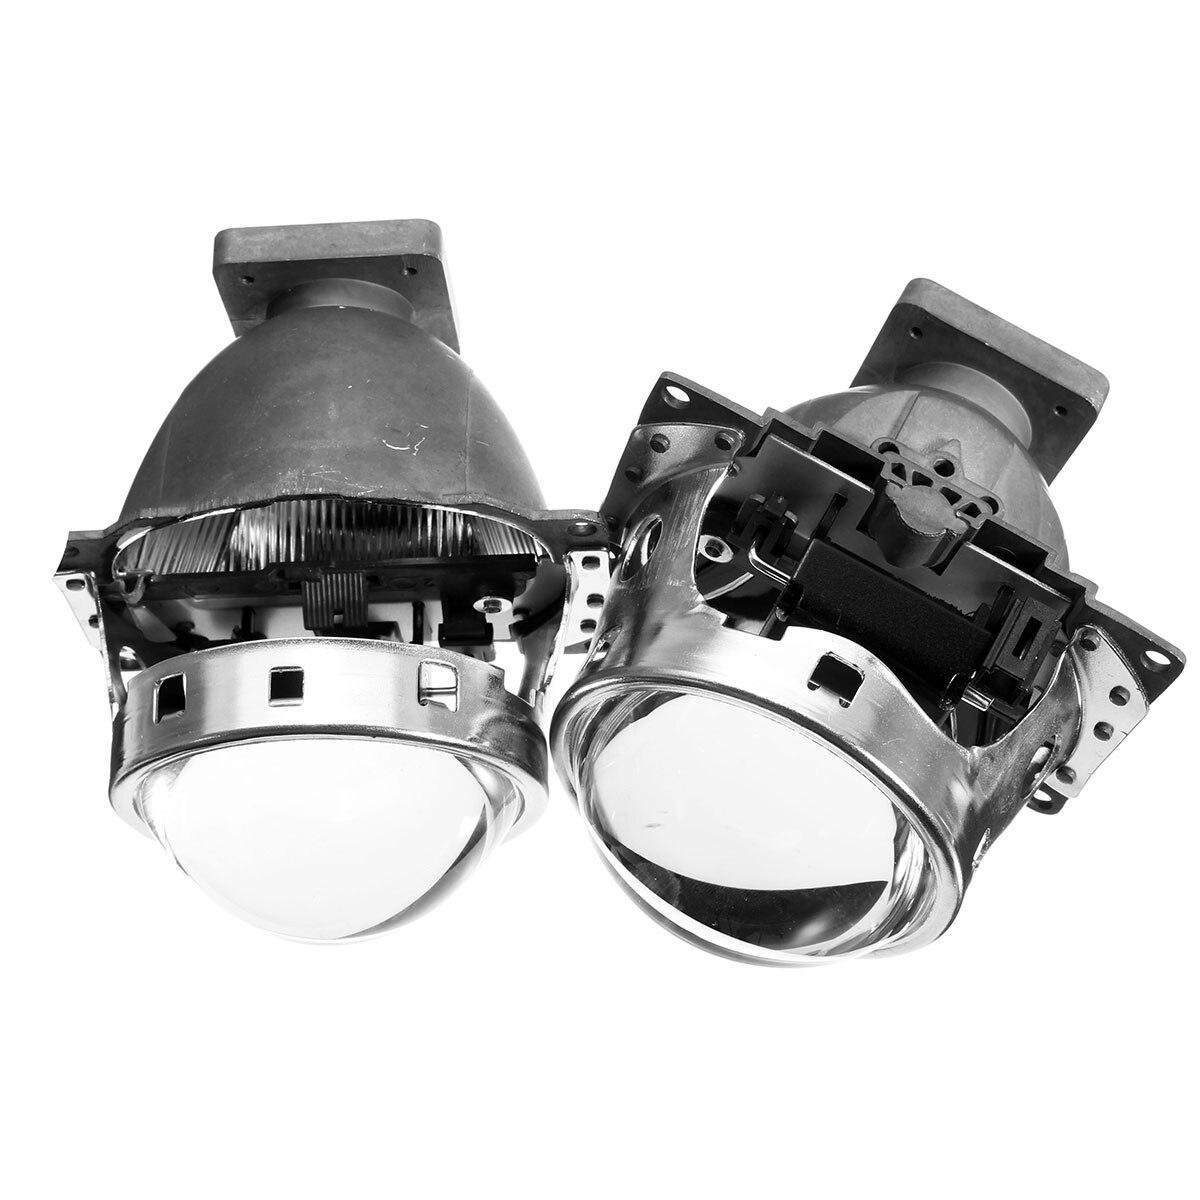 2pcs Car Headlight for HID Bi xenon Projector Lens Kit LHD for Koito Q5 35W Headlight